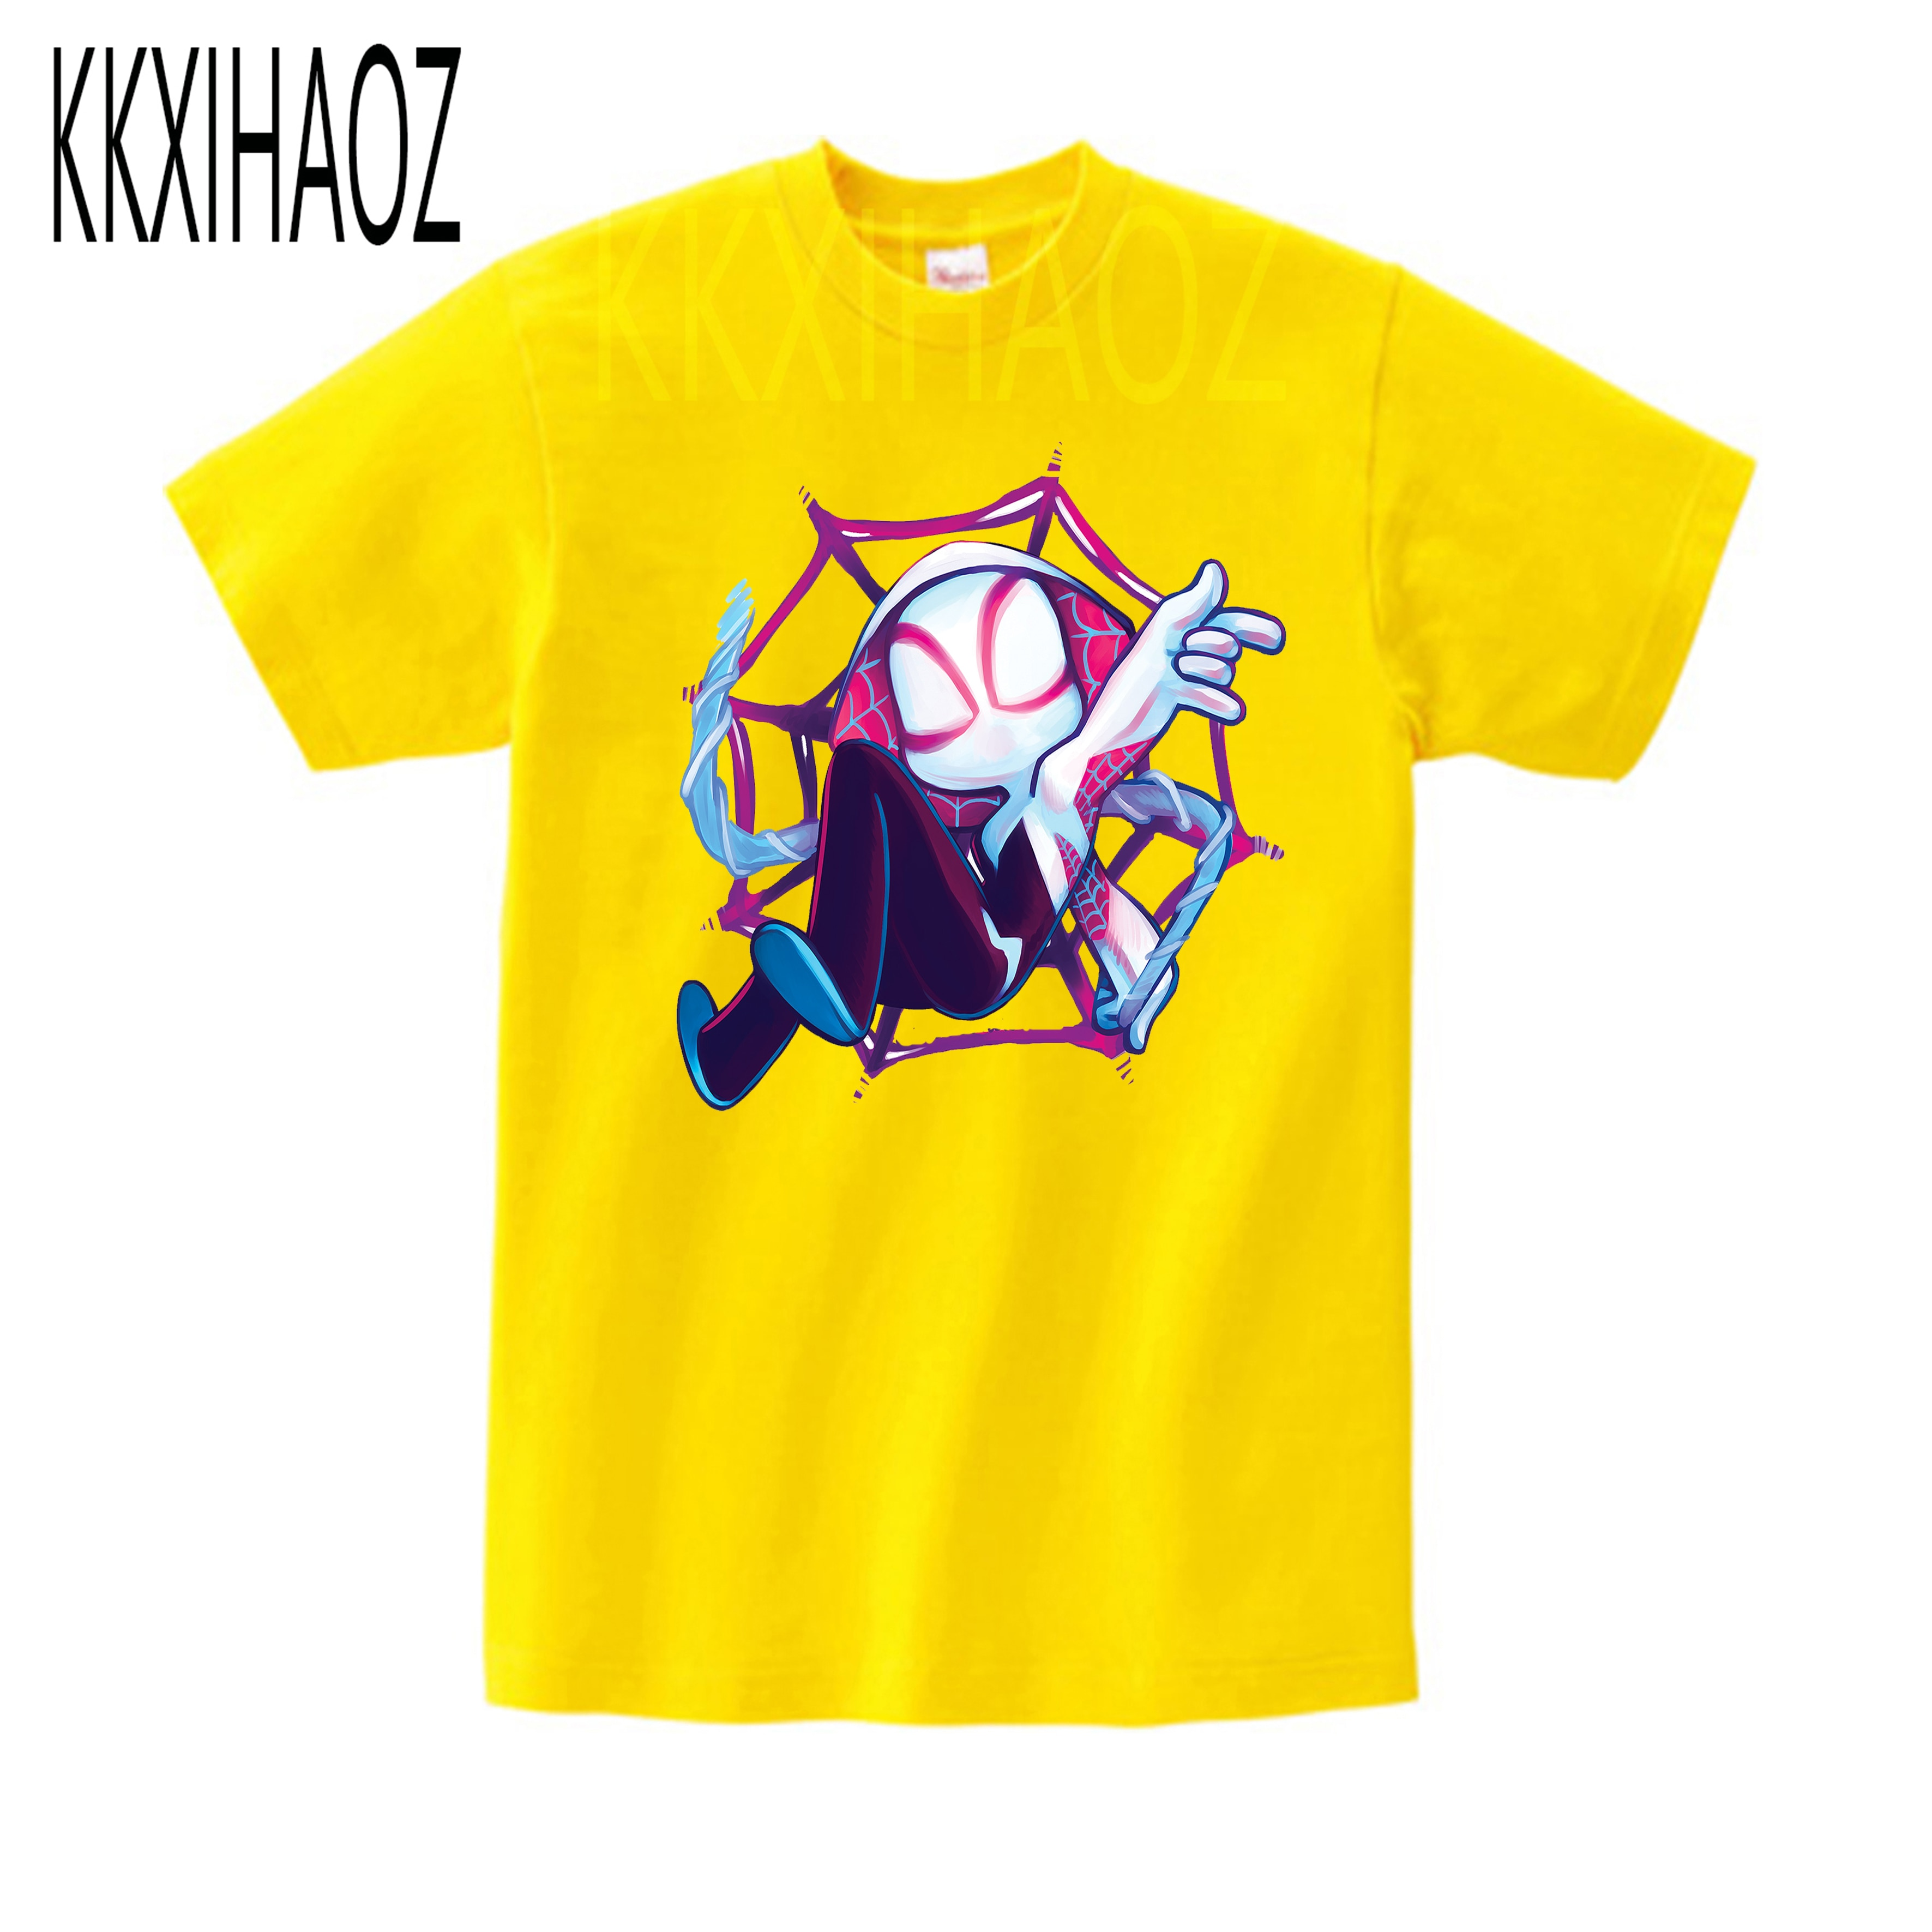 2020 interessante spider-gwen spider-man bonito dos desenhos animados modal kidswear menino/menina verão camiseta de manga curta roupas do miúdo t camisa menino